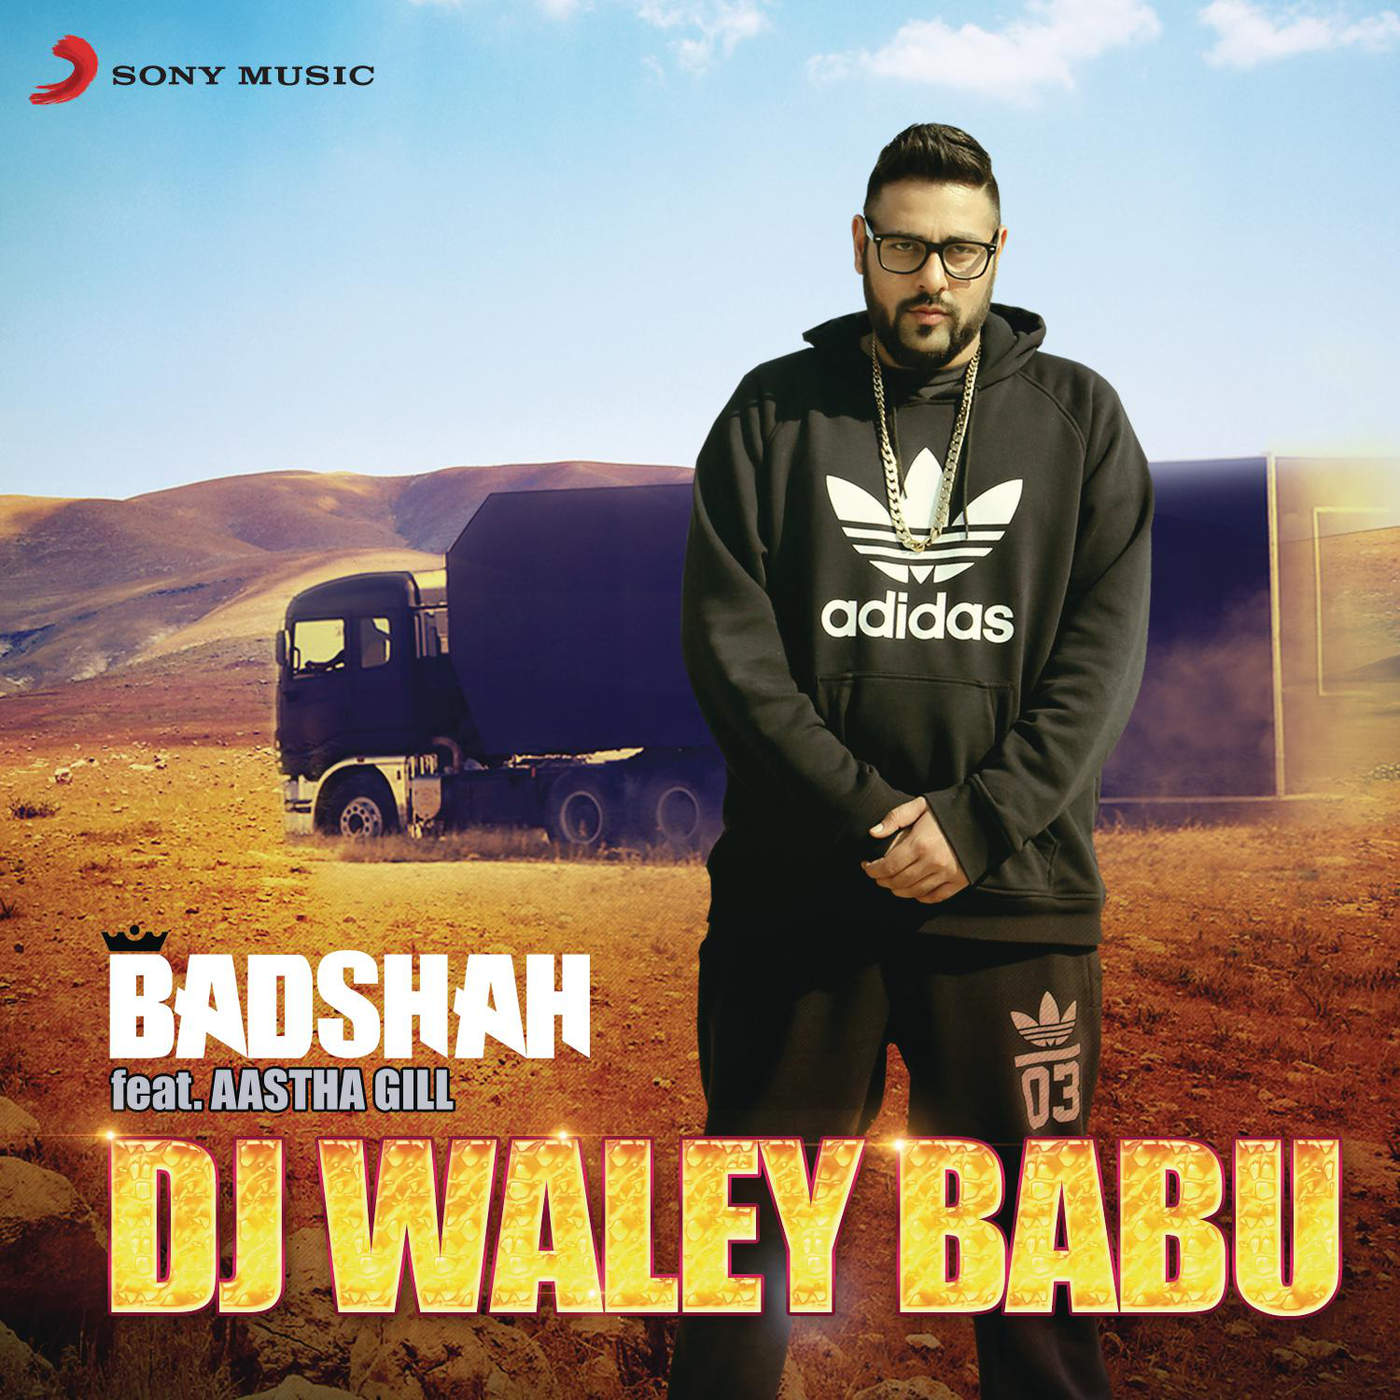 Badshah - Dj Waley Babu (feat. Aastha Gill) - Single